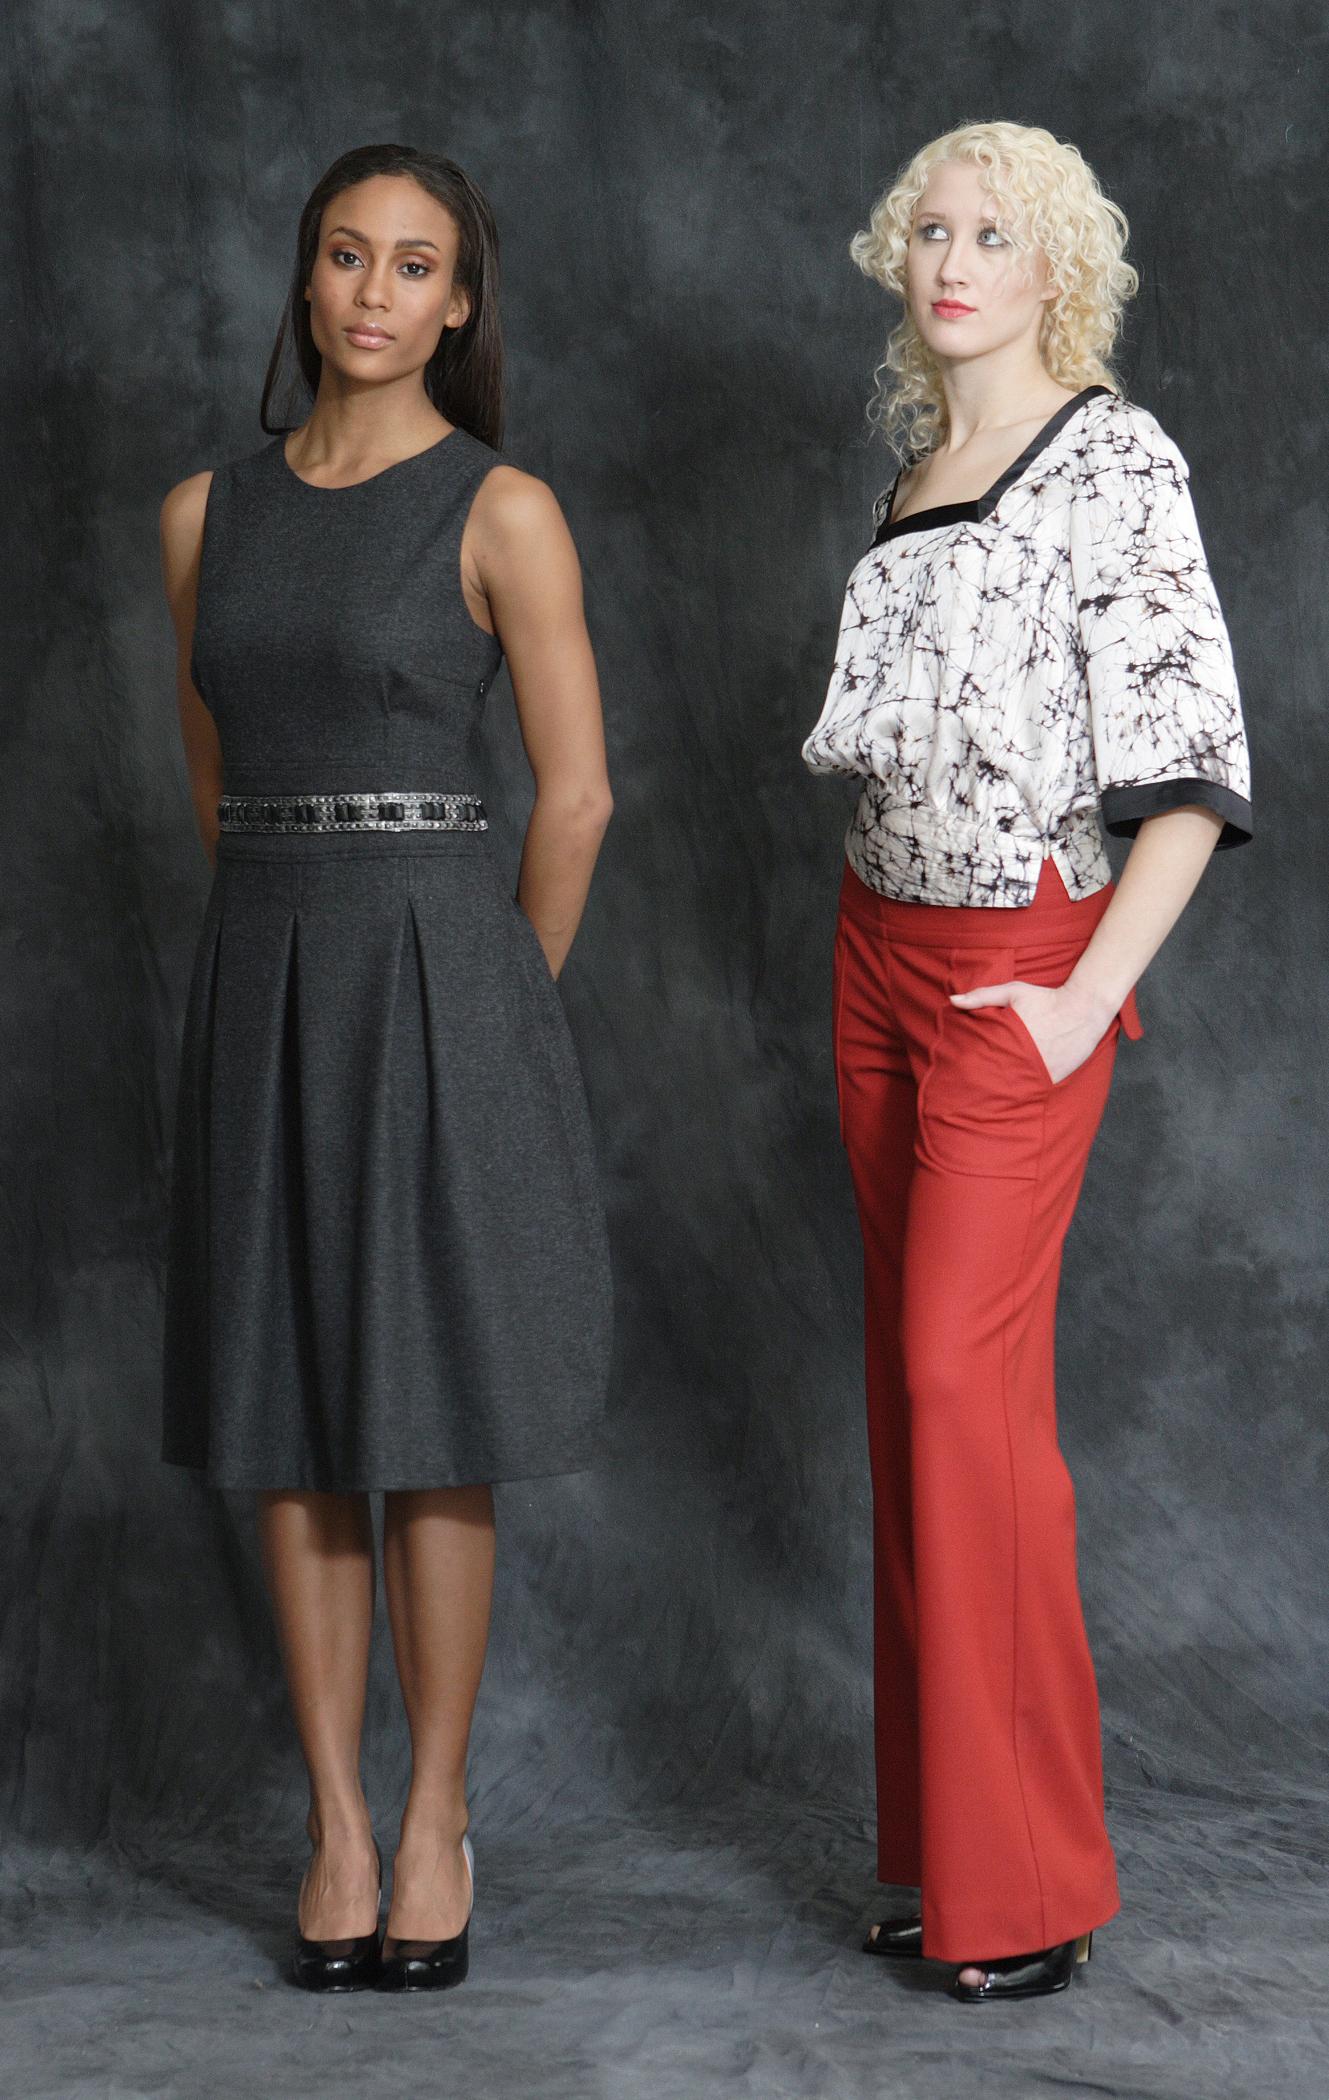 Wool Flannel High Waist Pleat Dress w/ Jeweled Trim  Web Print Silk Charmeuse Square Cut Blouse w/ Quilt Stitch Waist  Stretch Flannel Wide Leg Trouser w/Quilt Stitch Waist.